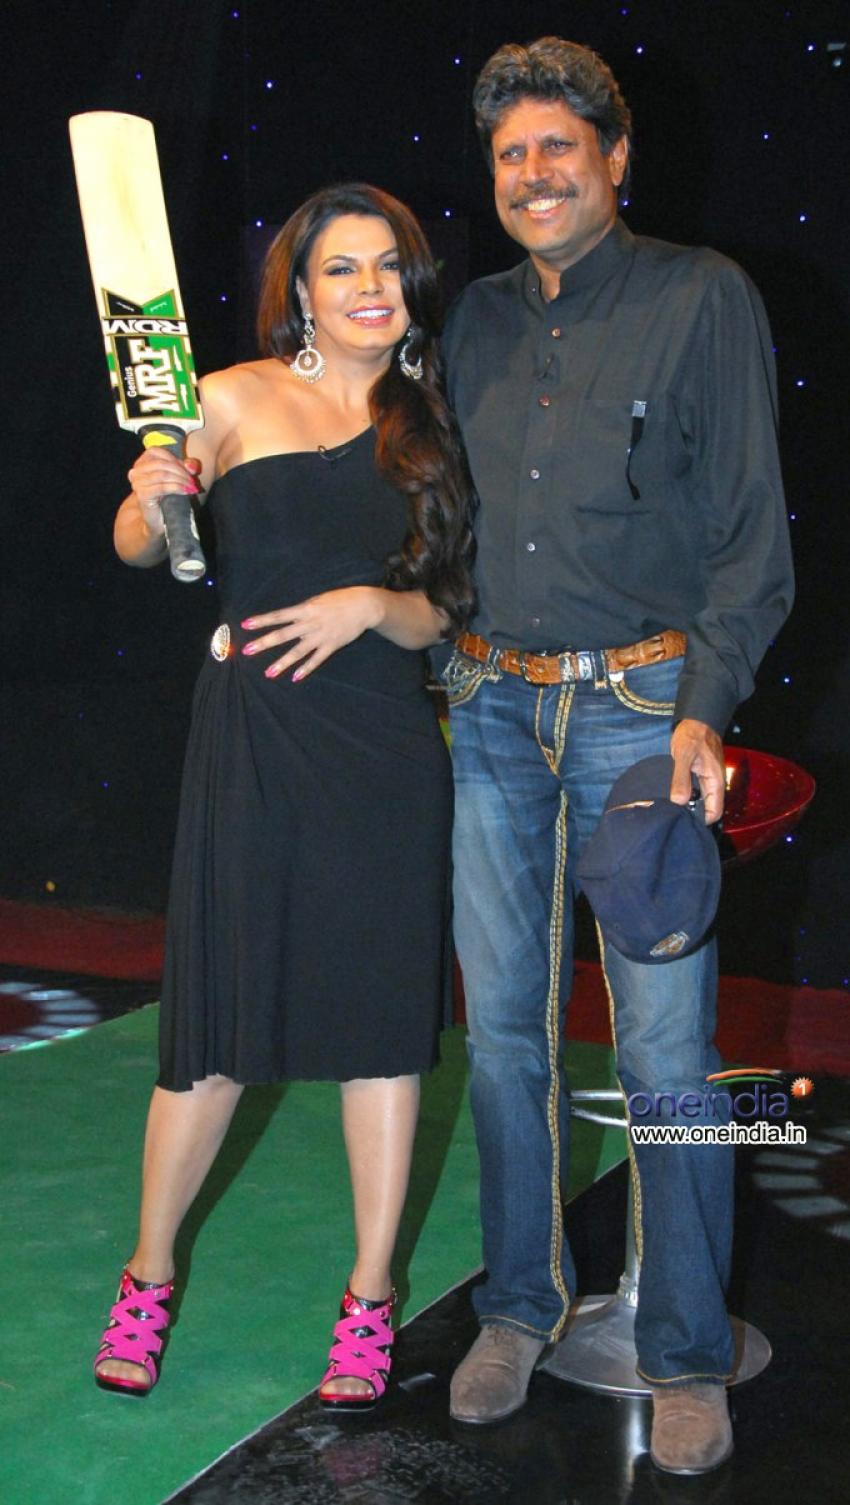 Kapil Dev on Cricket Show For Aaj Tak Photos - FilmiBeat